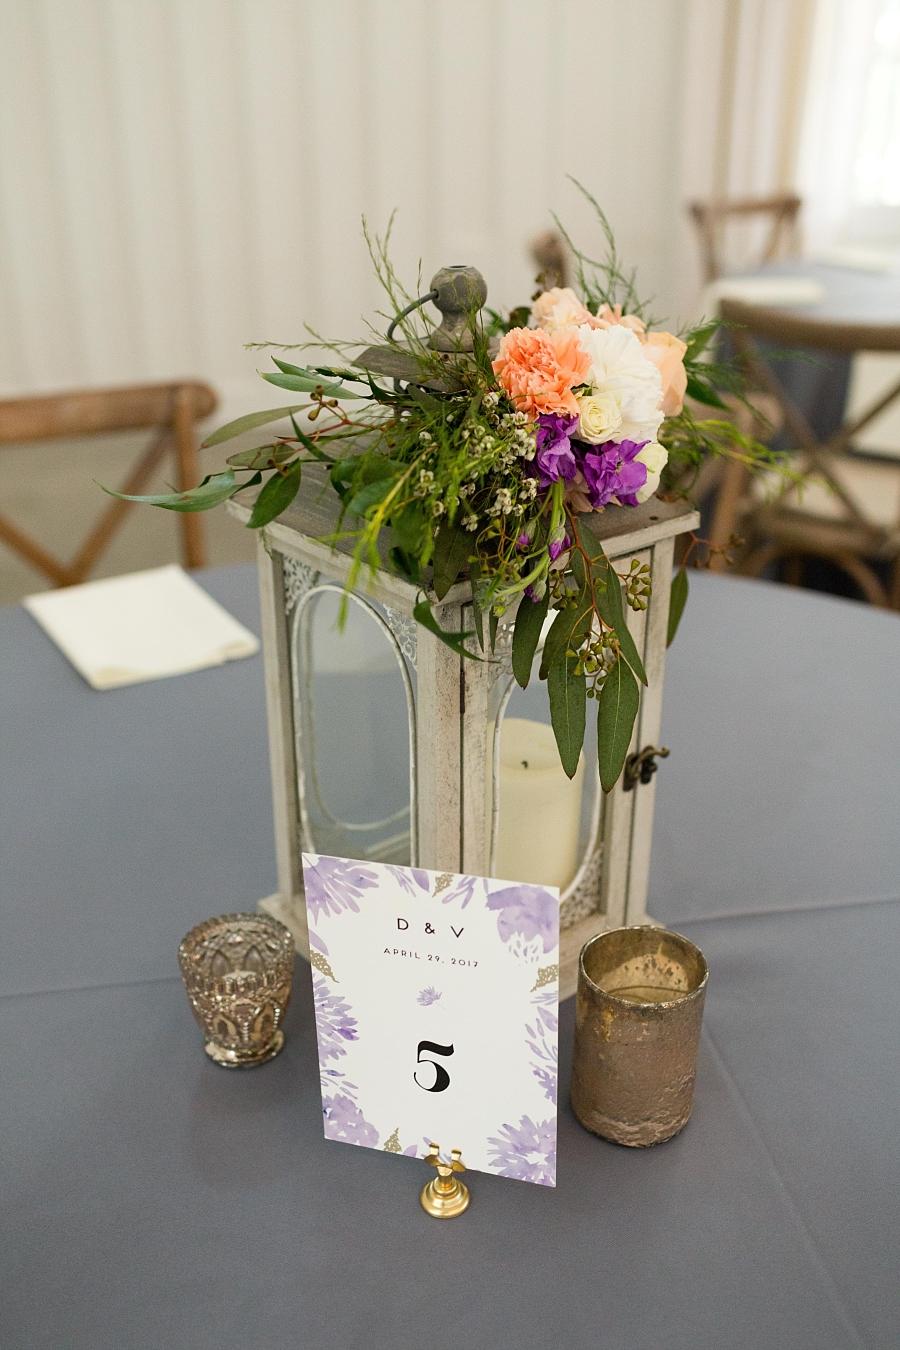 Stacy-Anderson-Photography-The-Farmhouse-Houston-Wedding-Photographer_0039.jpg